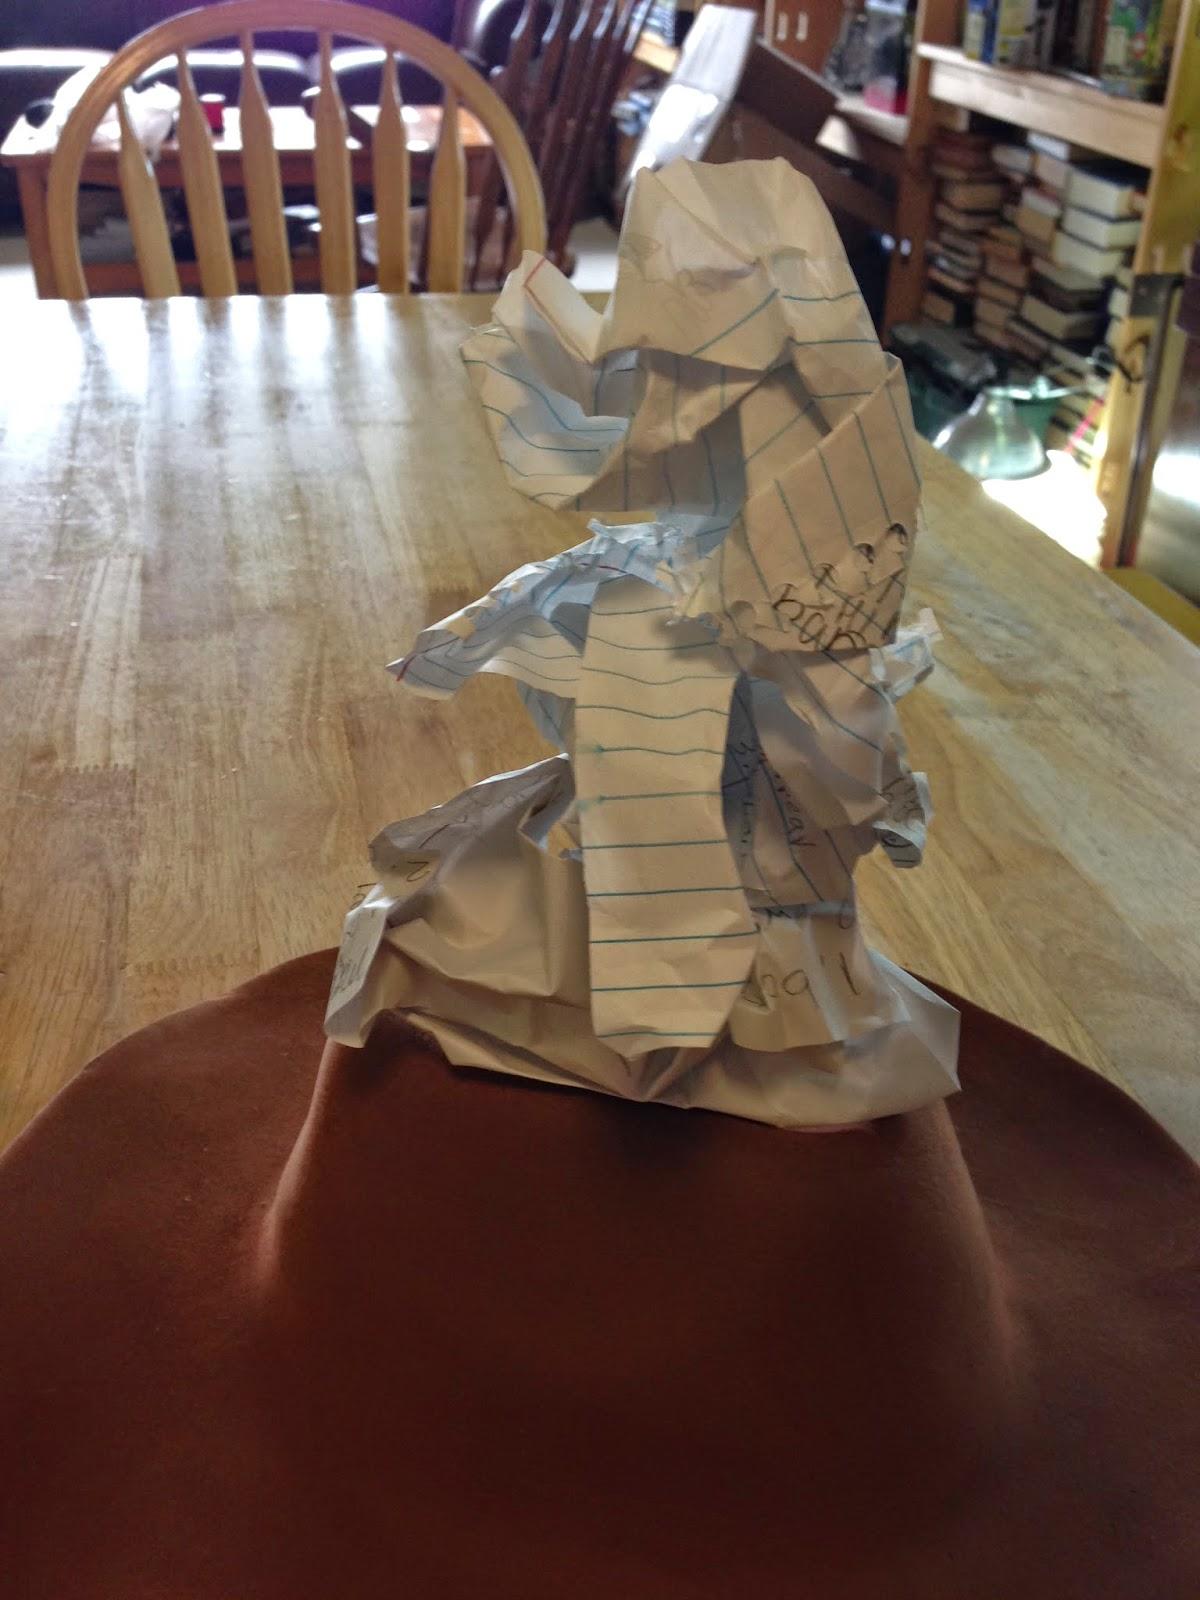 Sorting Hat Tutorial. It looks so awesome! #harrypotter #sortinghat #tutorial